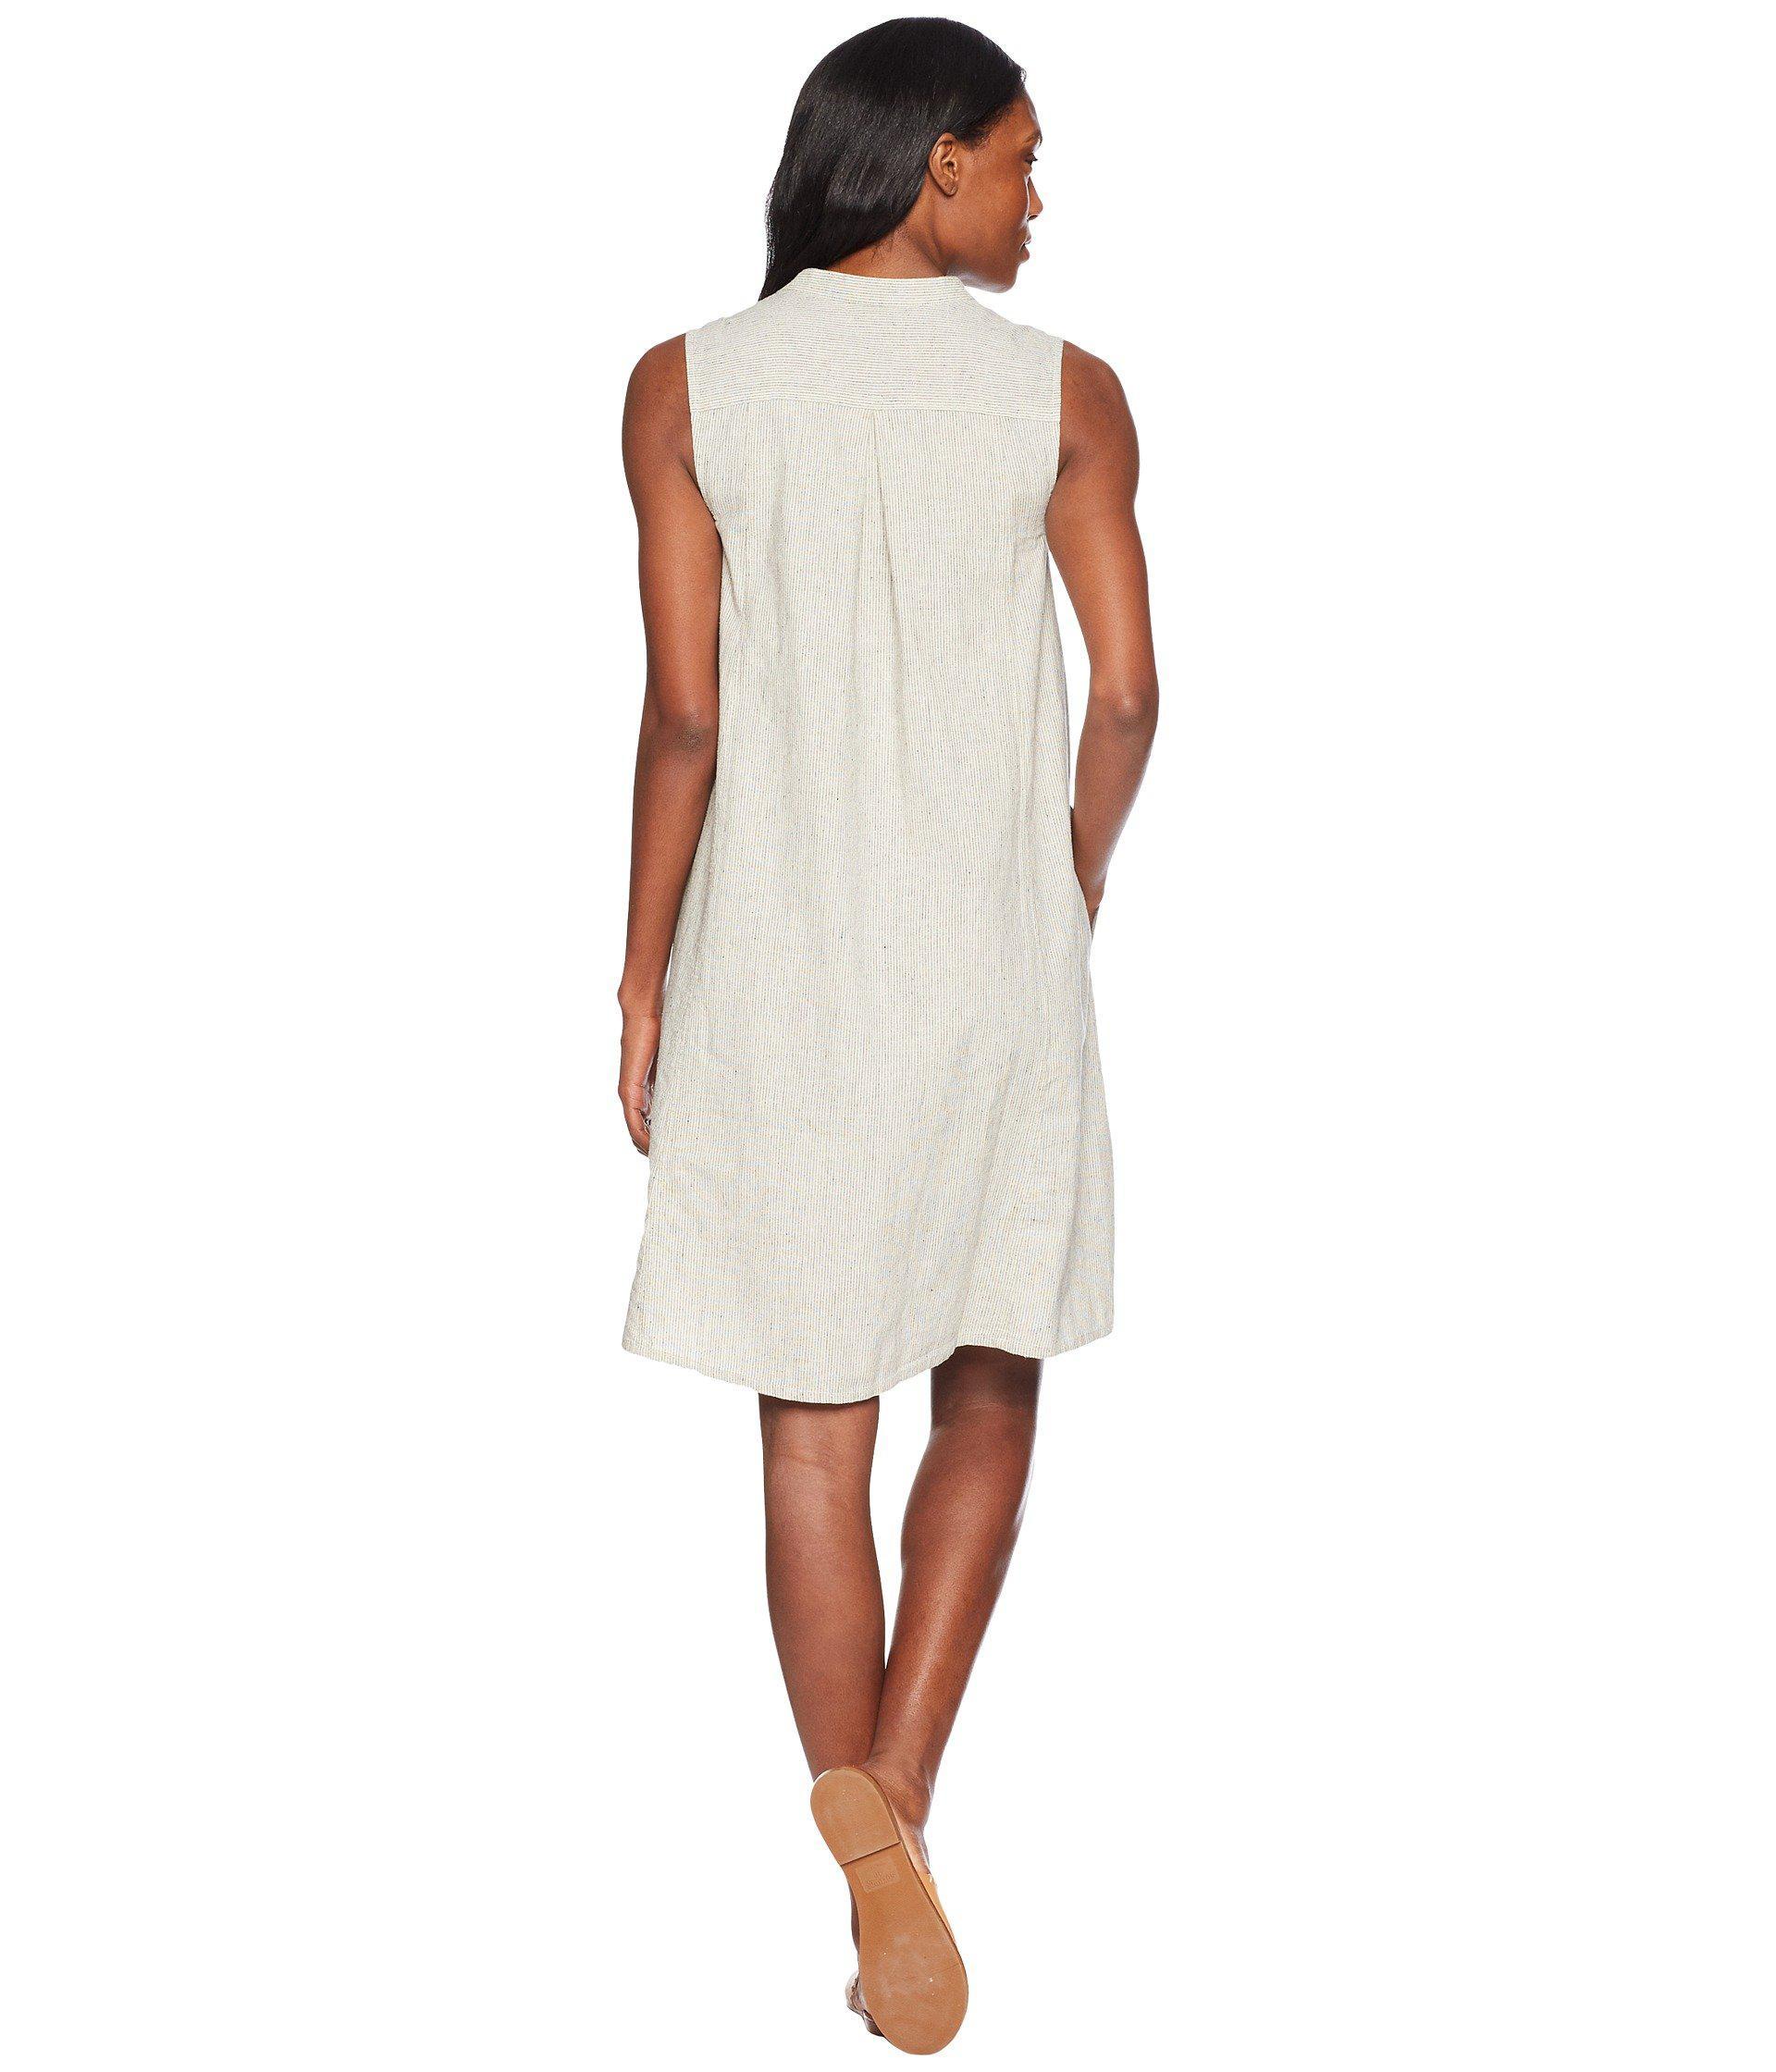 12f20abc9590b Nau - White Straight Up Sleeveless Dress - Lyst. View fullscreen